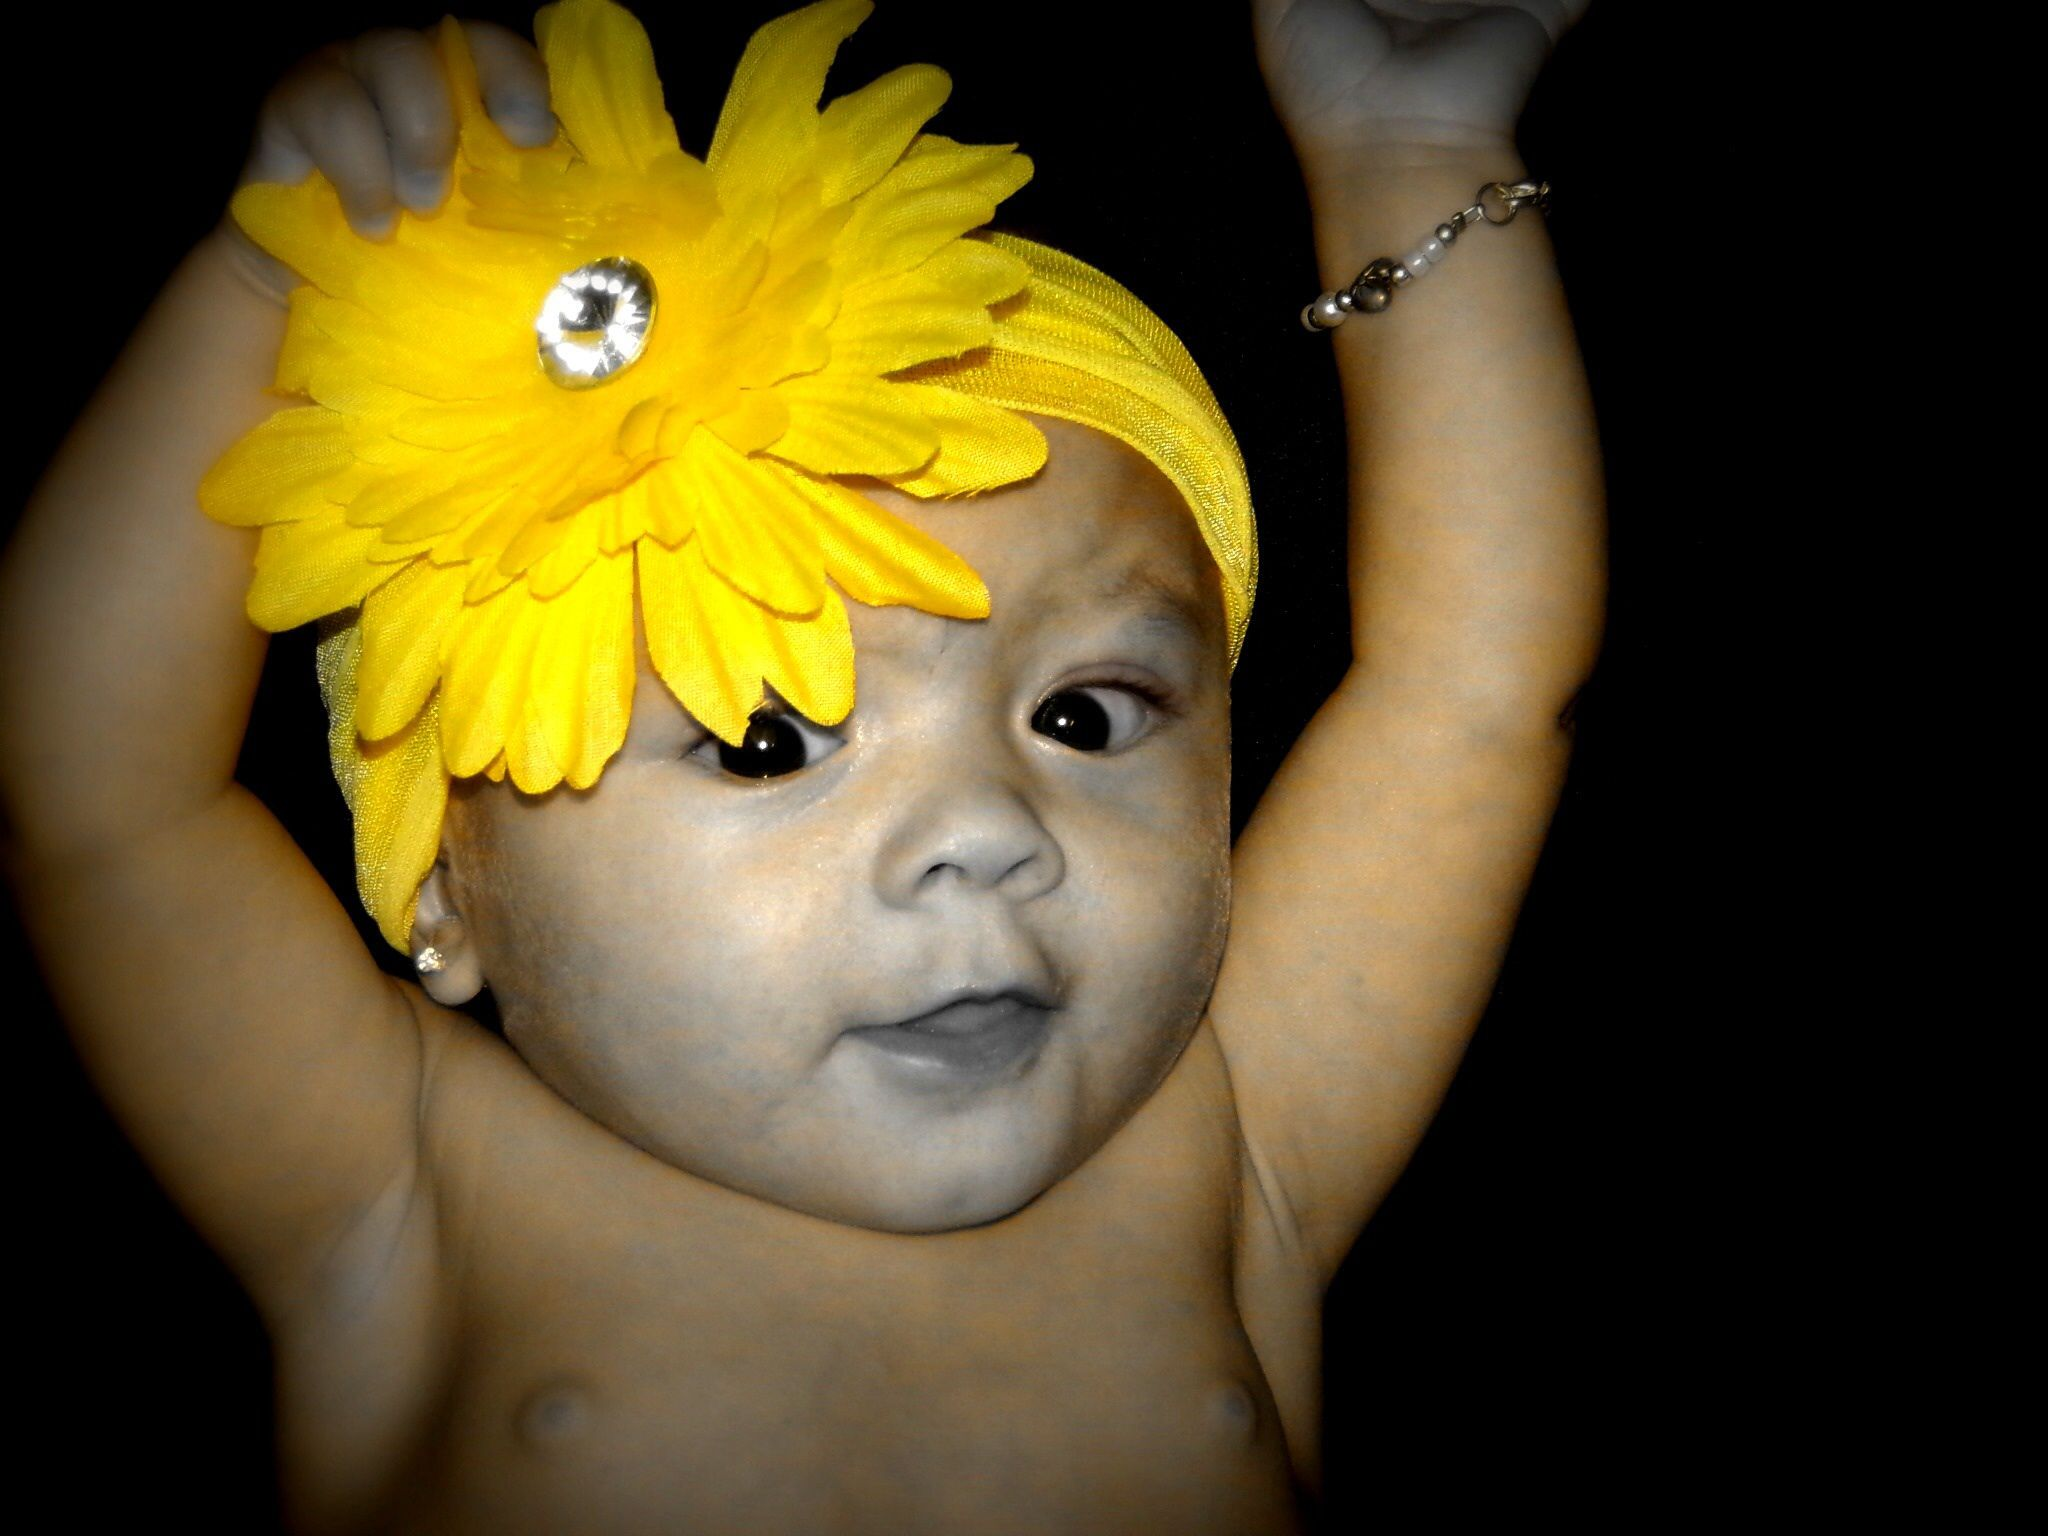 #yellow #flower #photography #photoideas #girl #yellow #flower #baby #precious